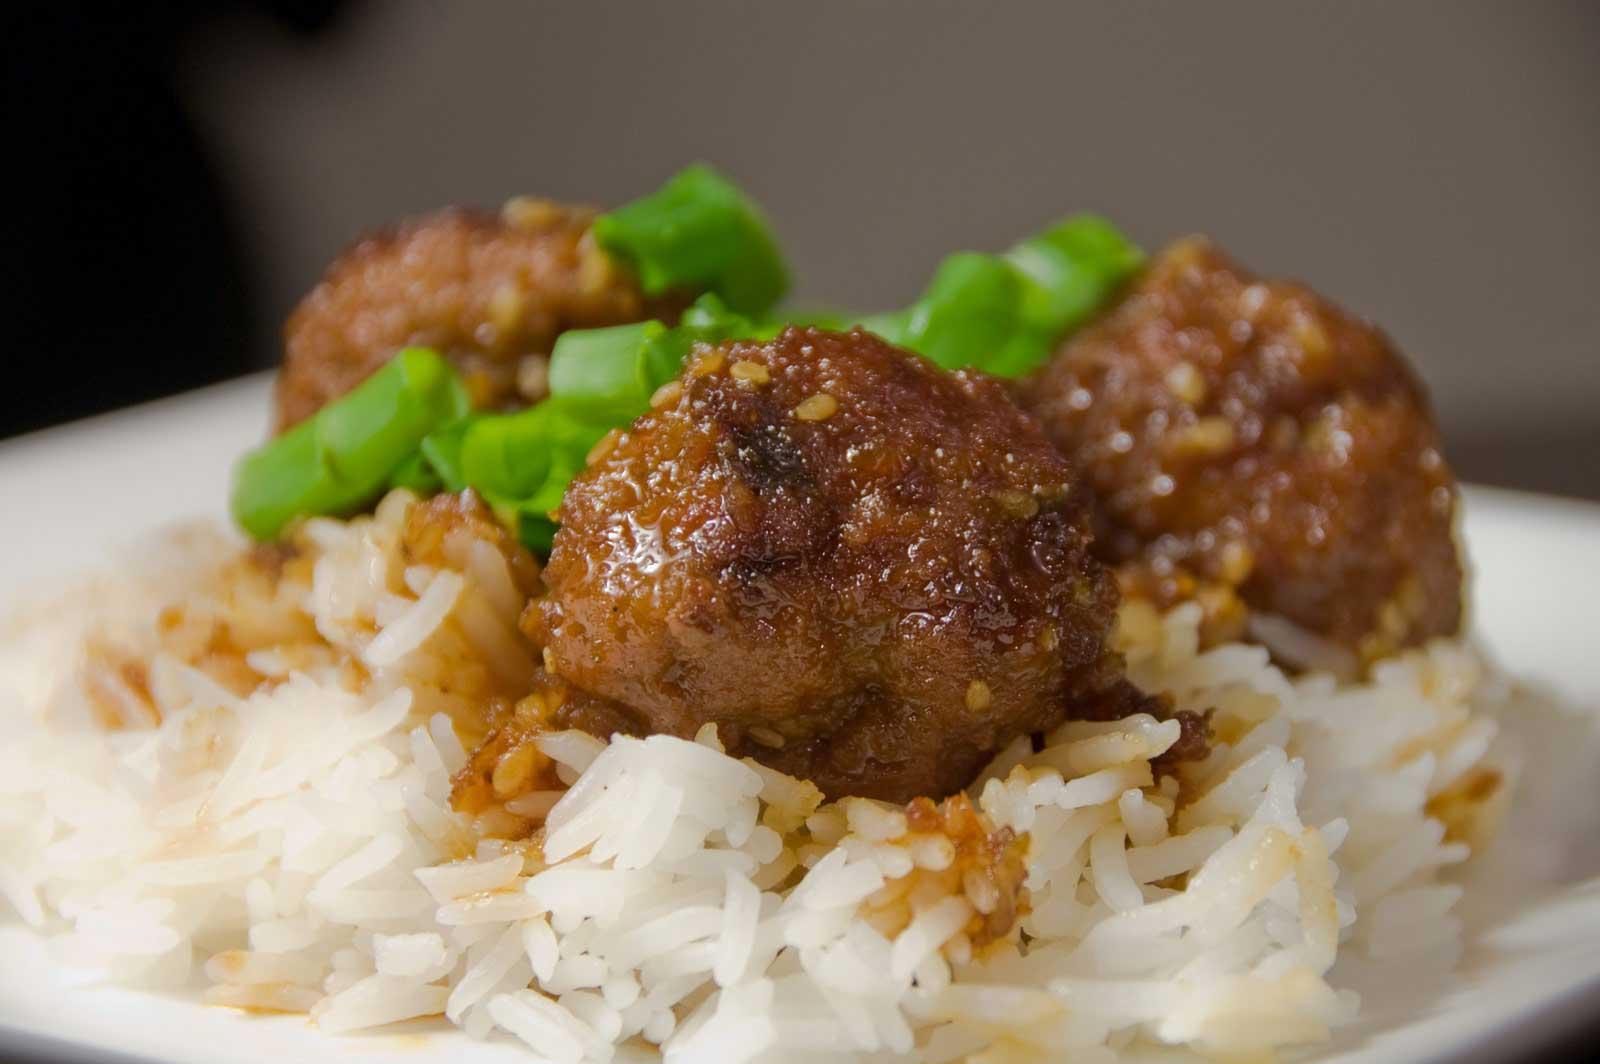 ... Turkey Meatballs Recipe - Crockpot Meatballs Recipe with Ground Turkey